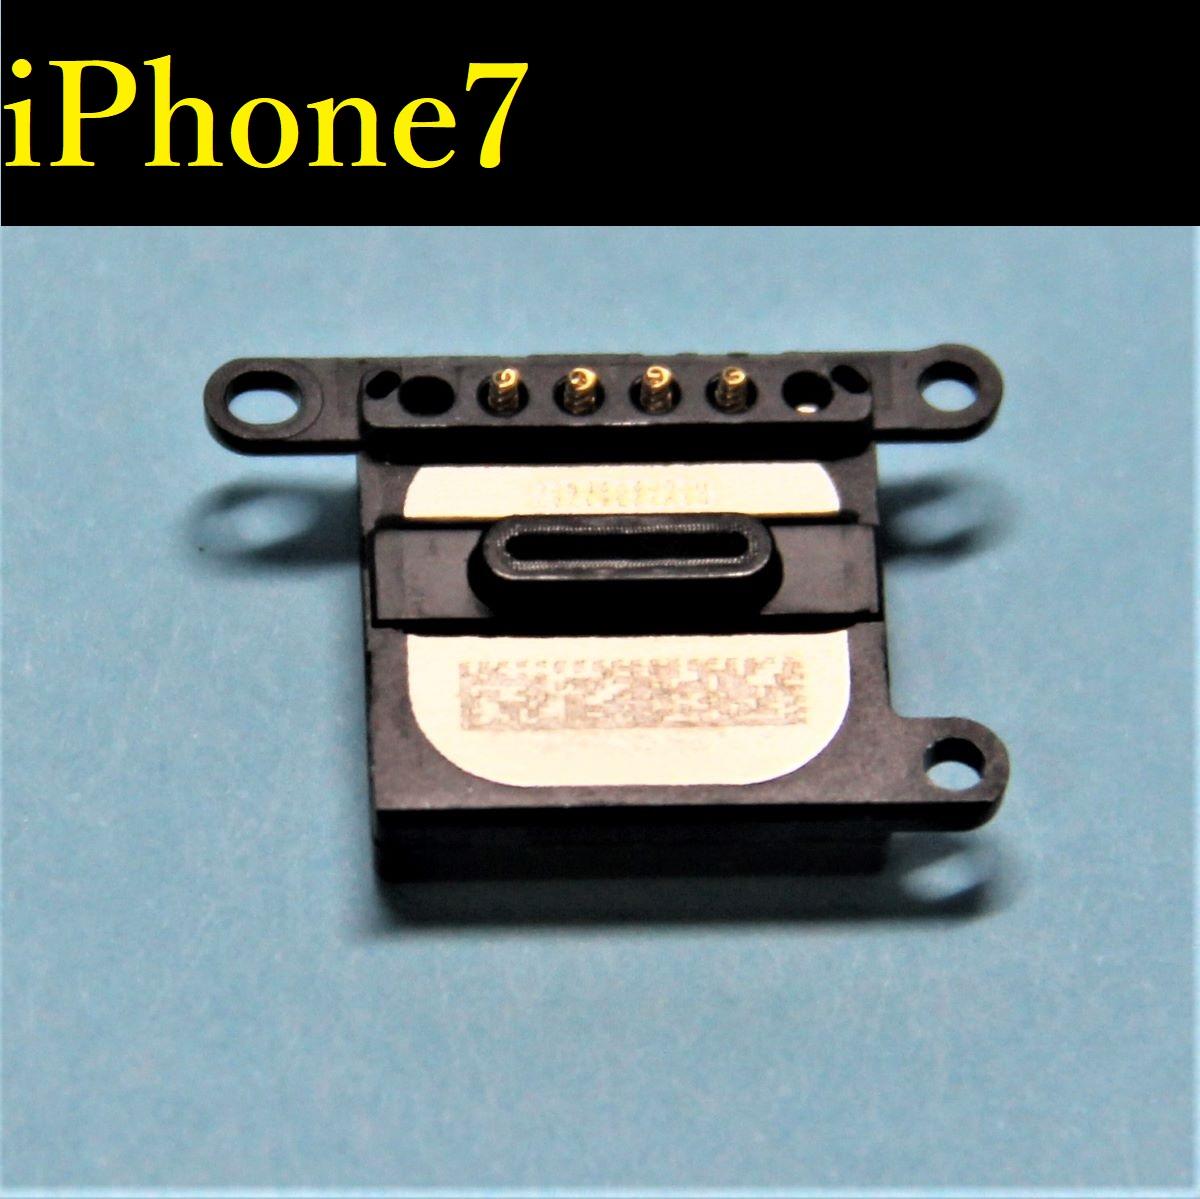 iPhone7イヤースピーカー 修理工具セット付き 修理交換パーツ 付与 上側スピーカーDIY修理 激安特価品 リペア部品 アイフォン